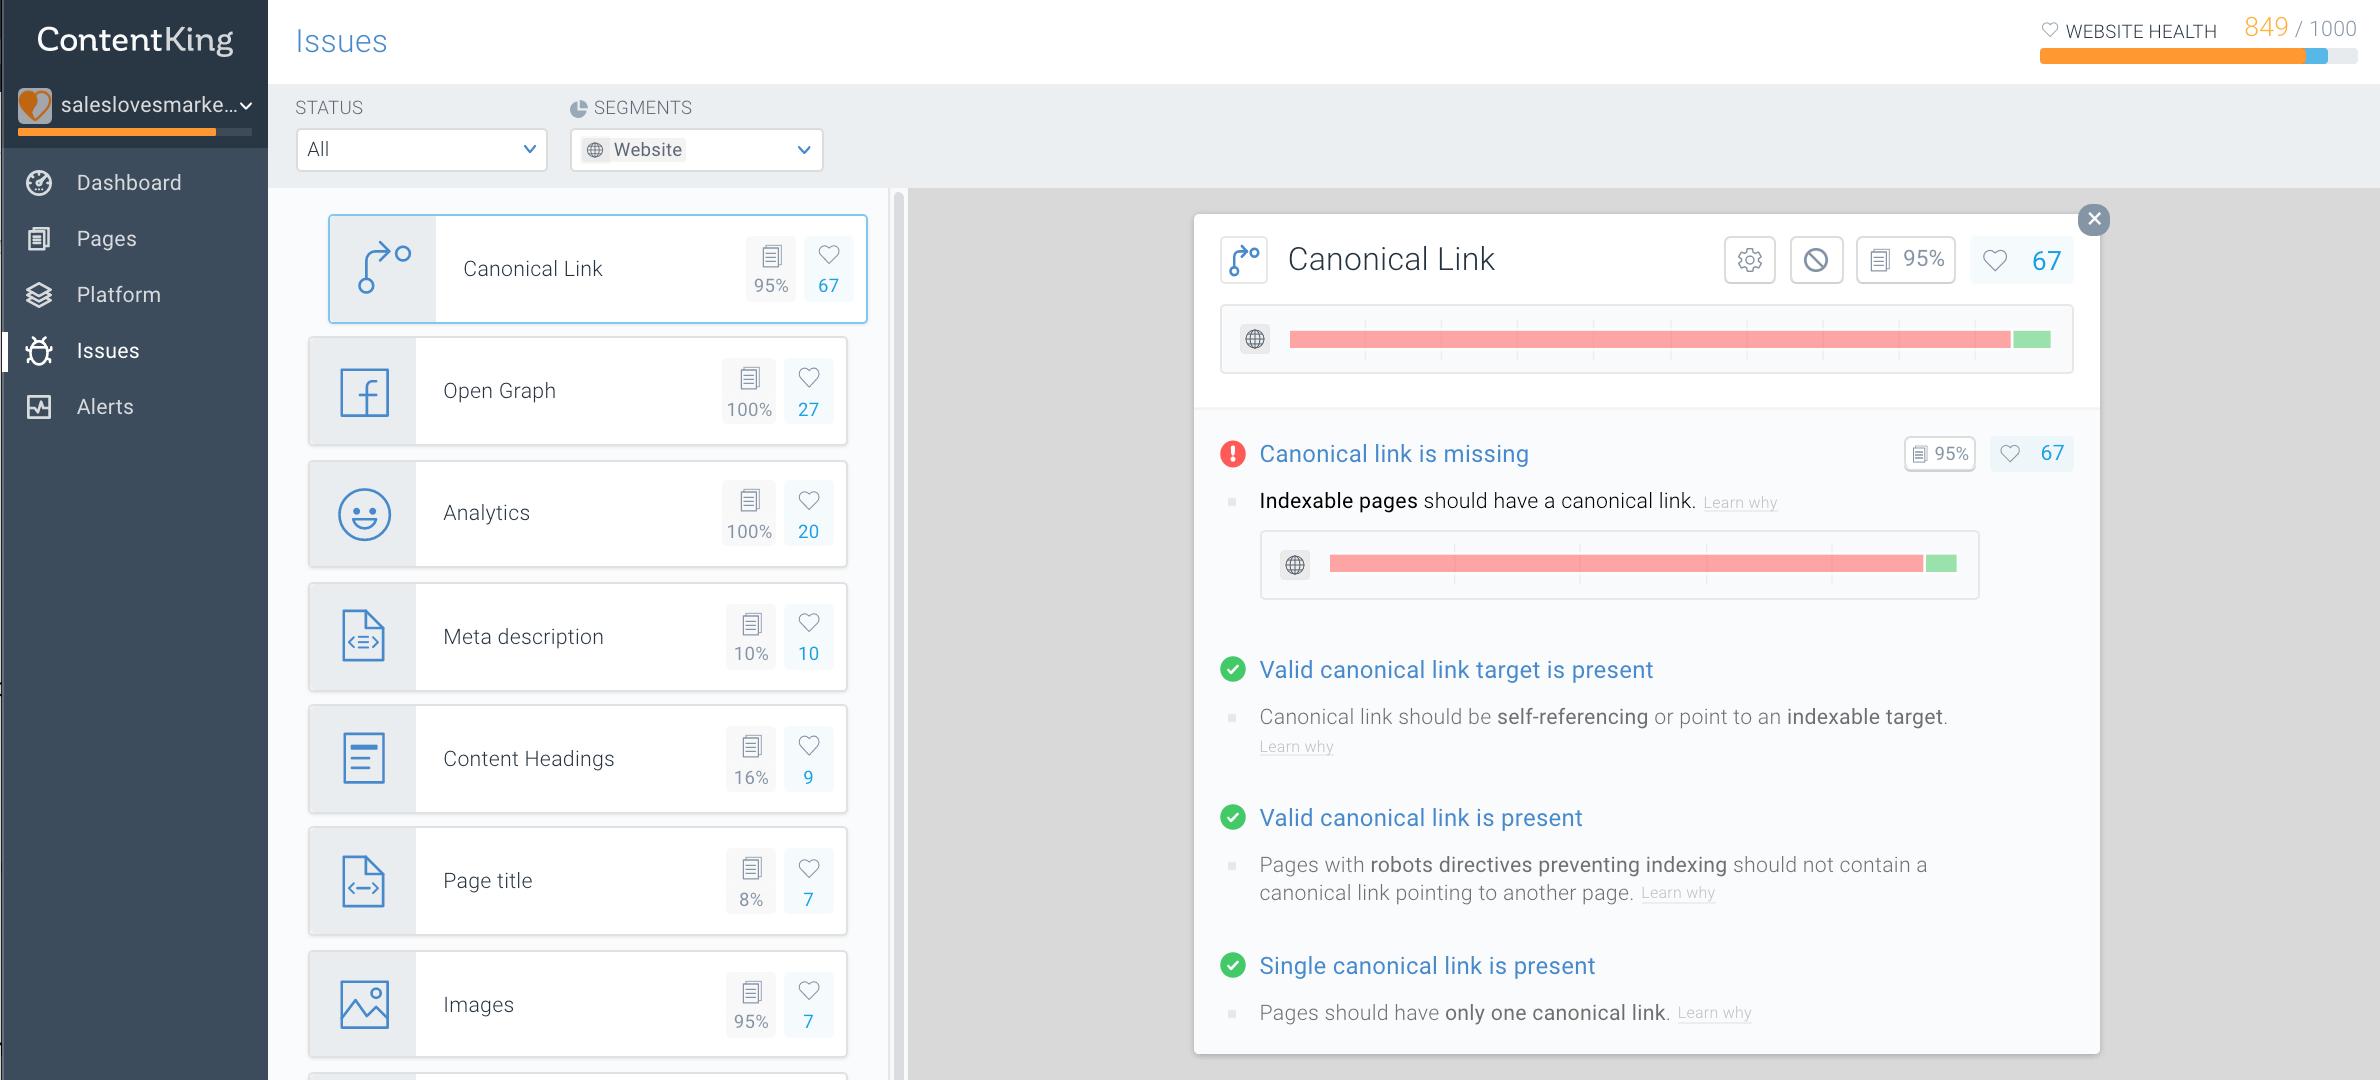 SEO ContentKing app on SalesLovesMarketing.co